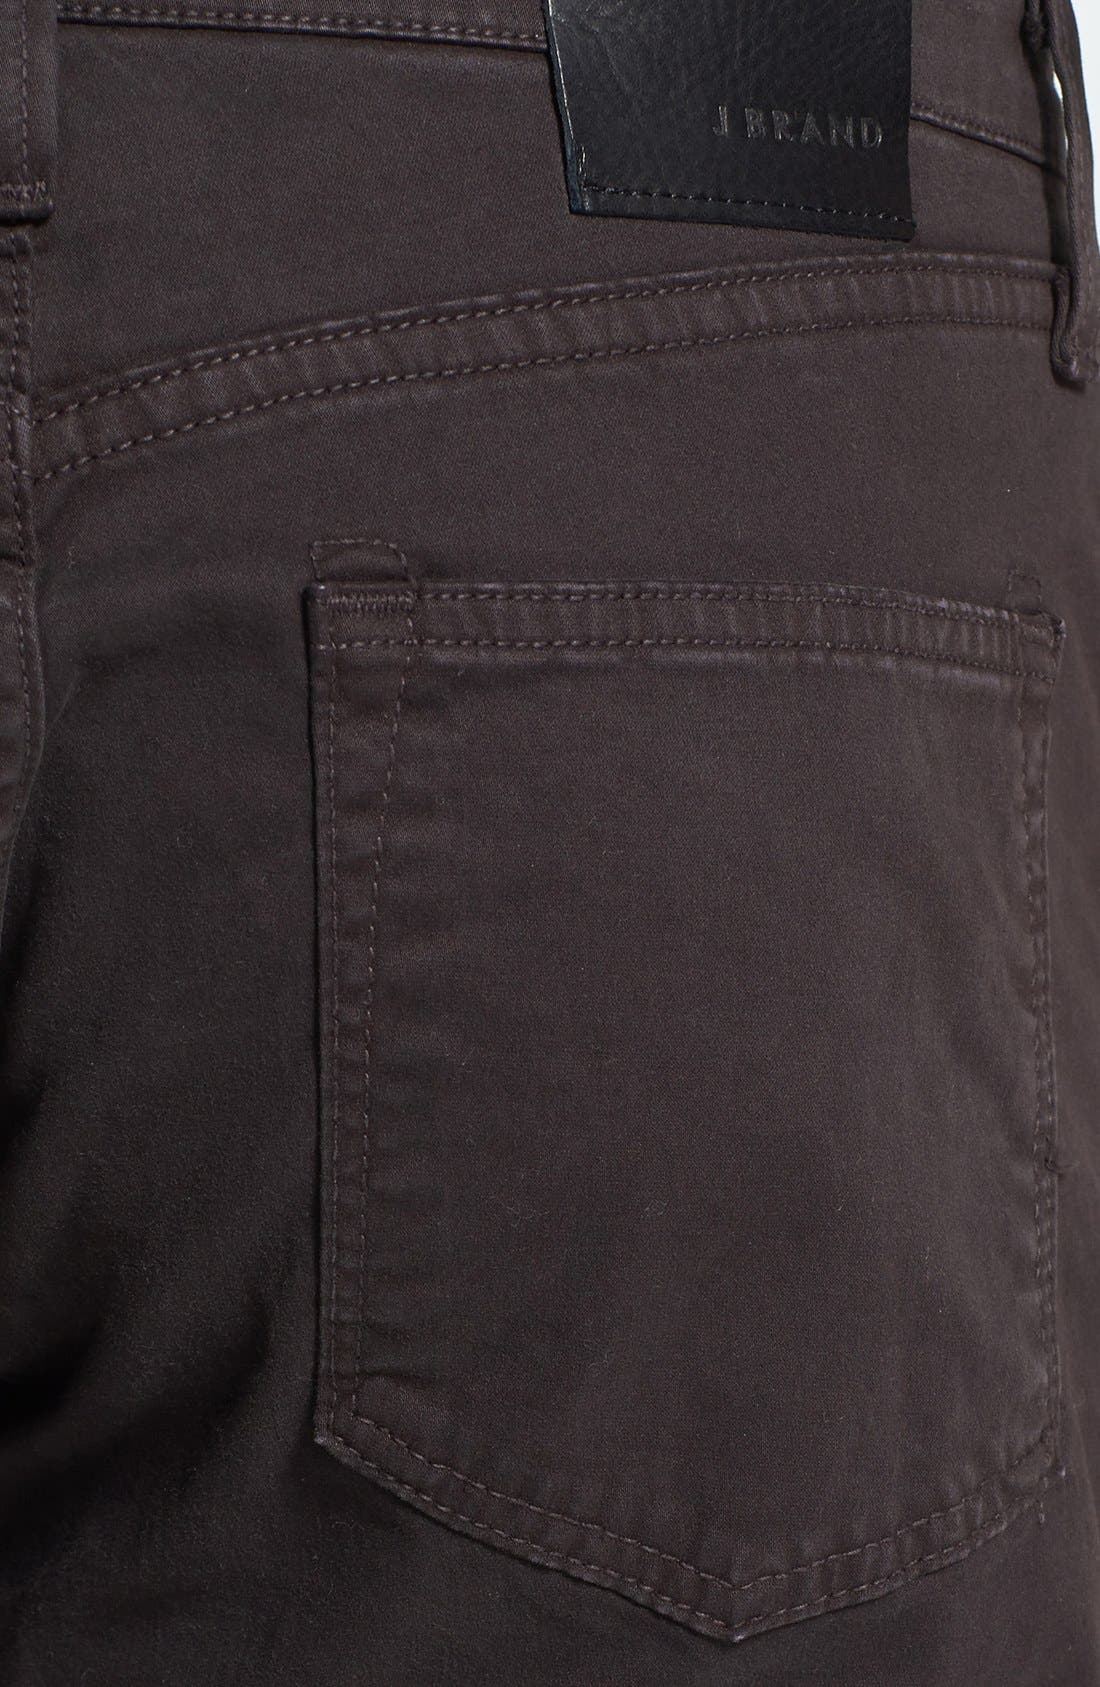 'Kane' Slim Fit Cotton Twill Pants,                             Alternate thumbnail 30, color,